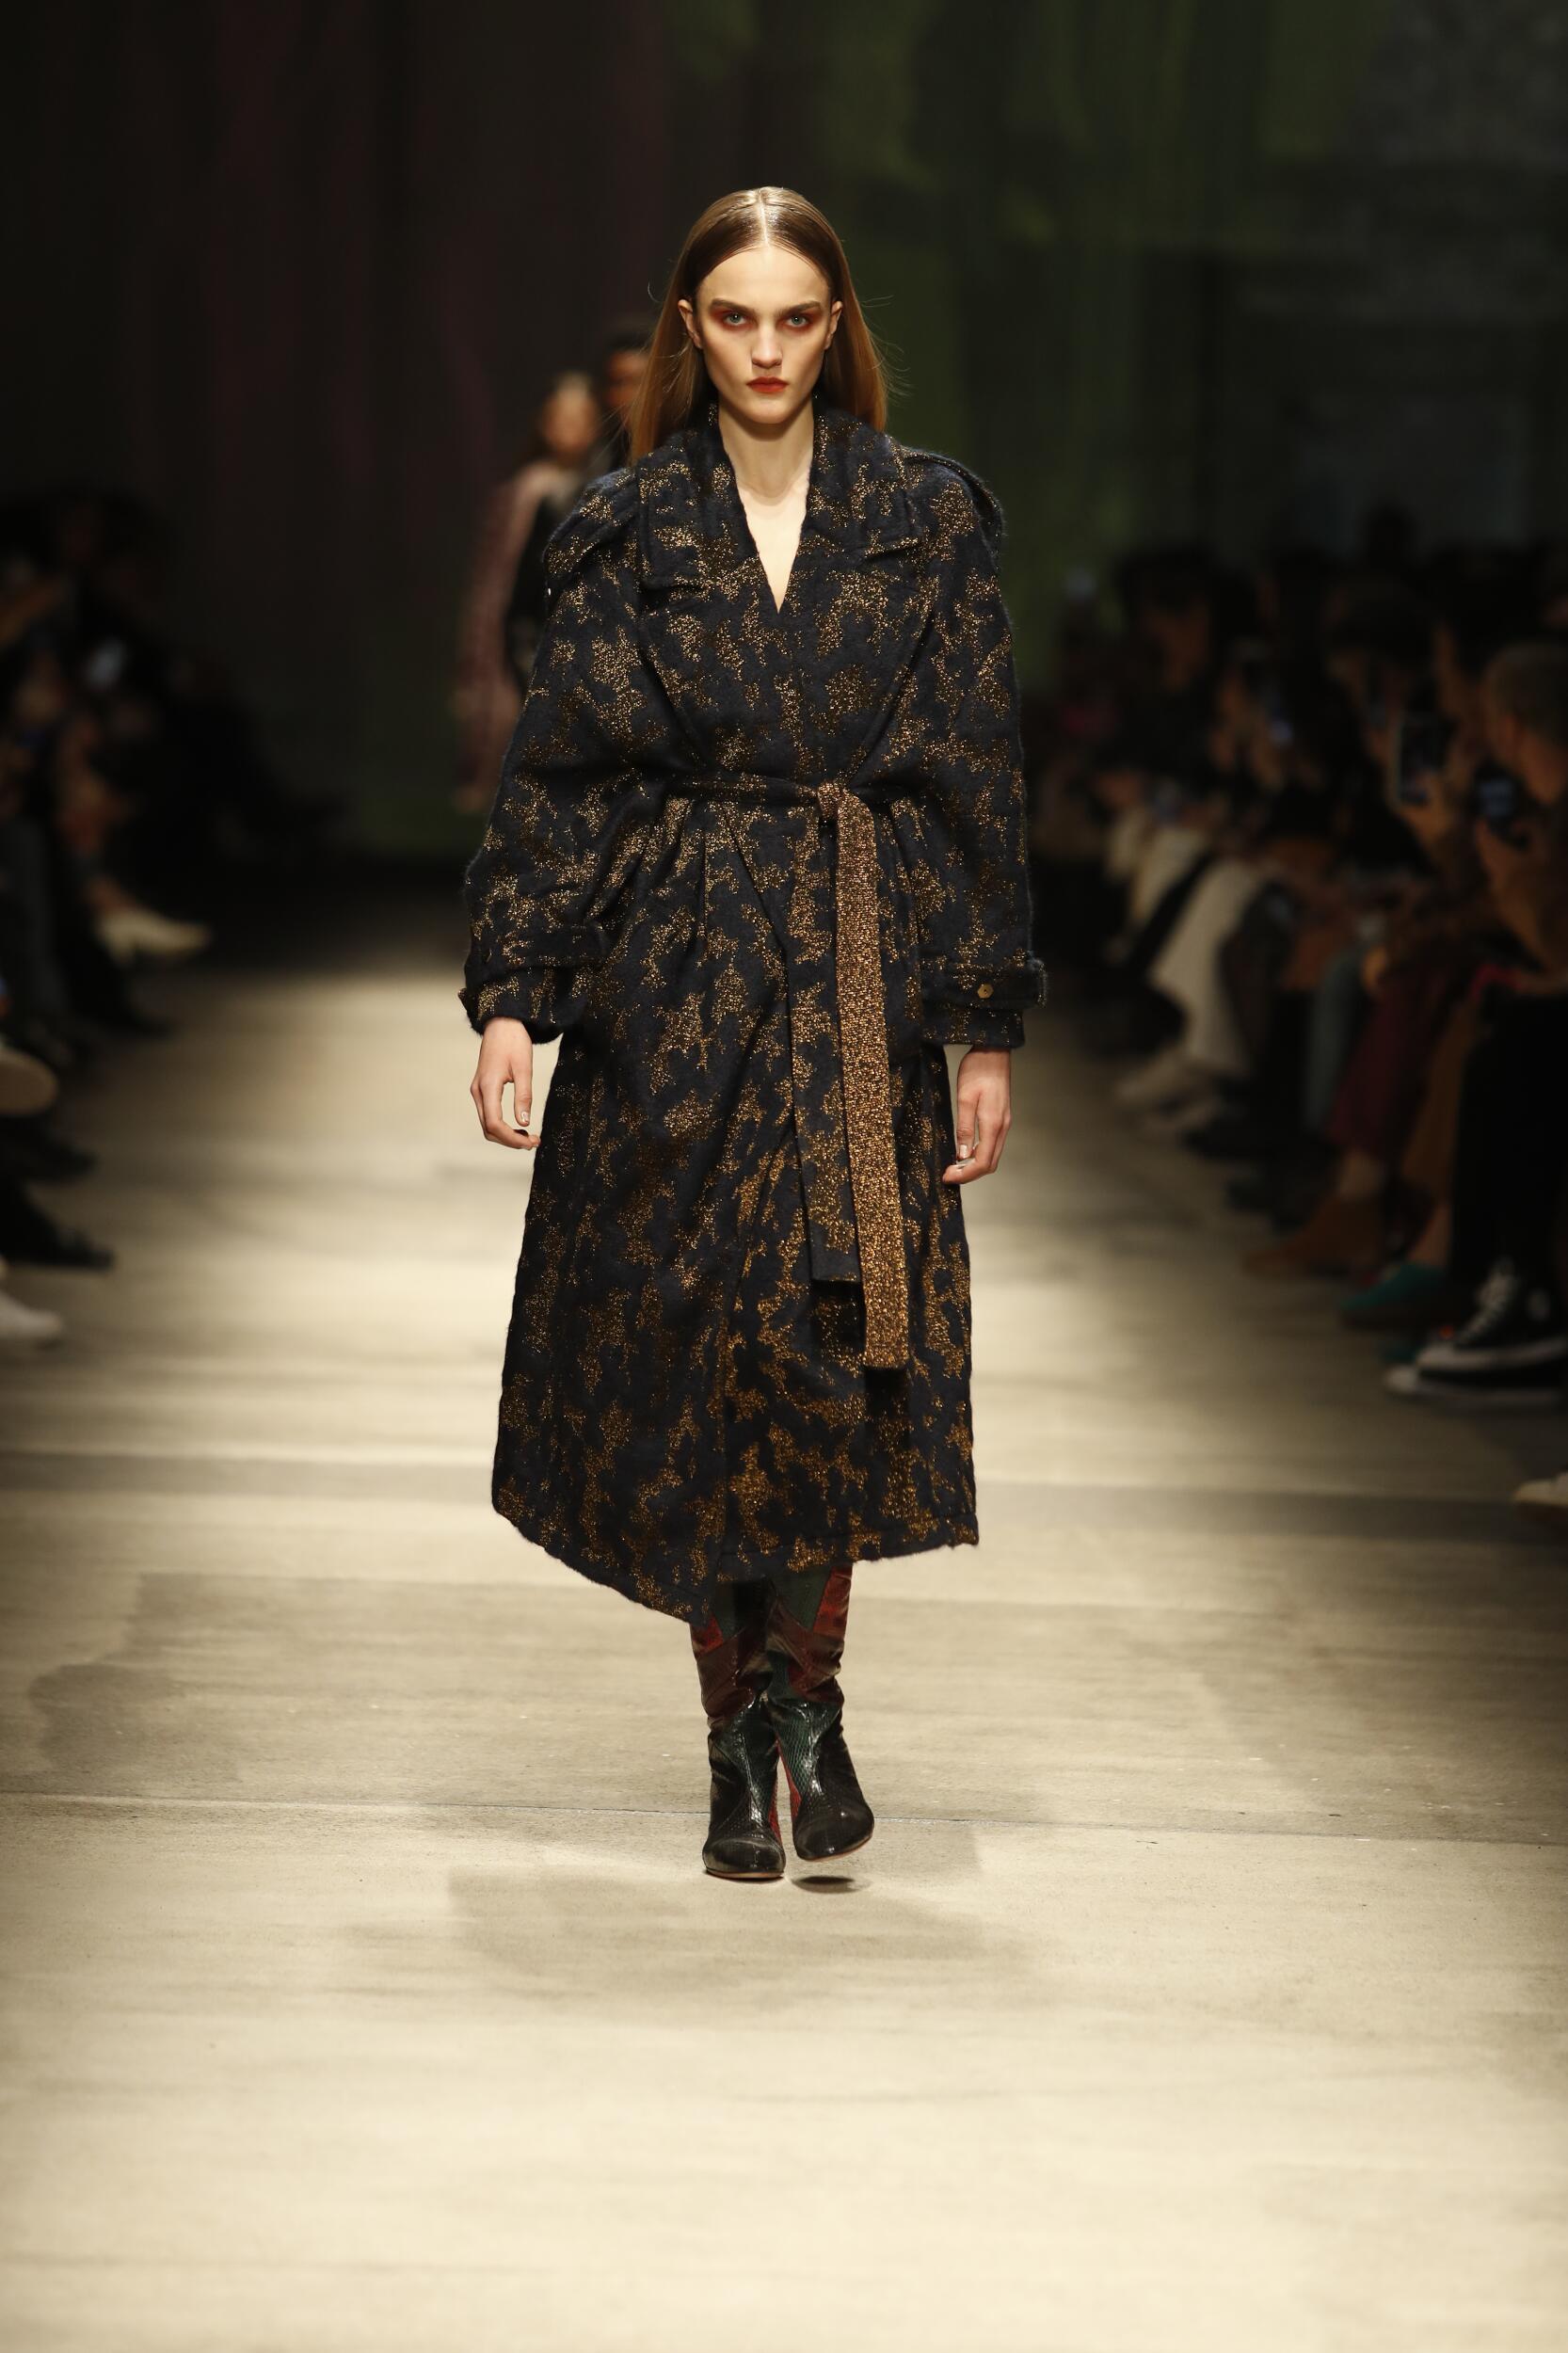 FW 2020 Missoni Show Milan Fashion Week